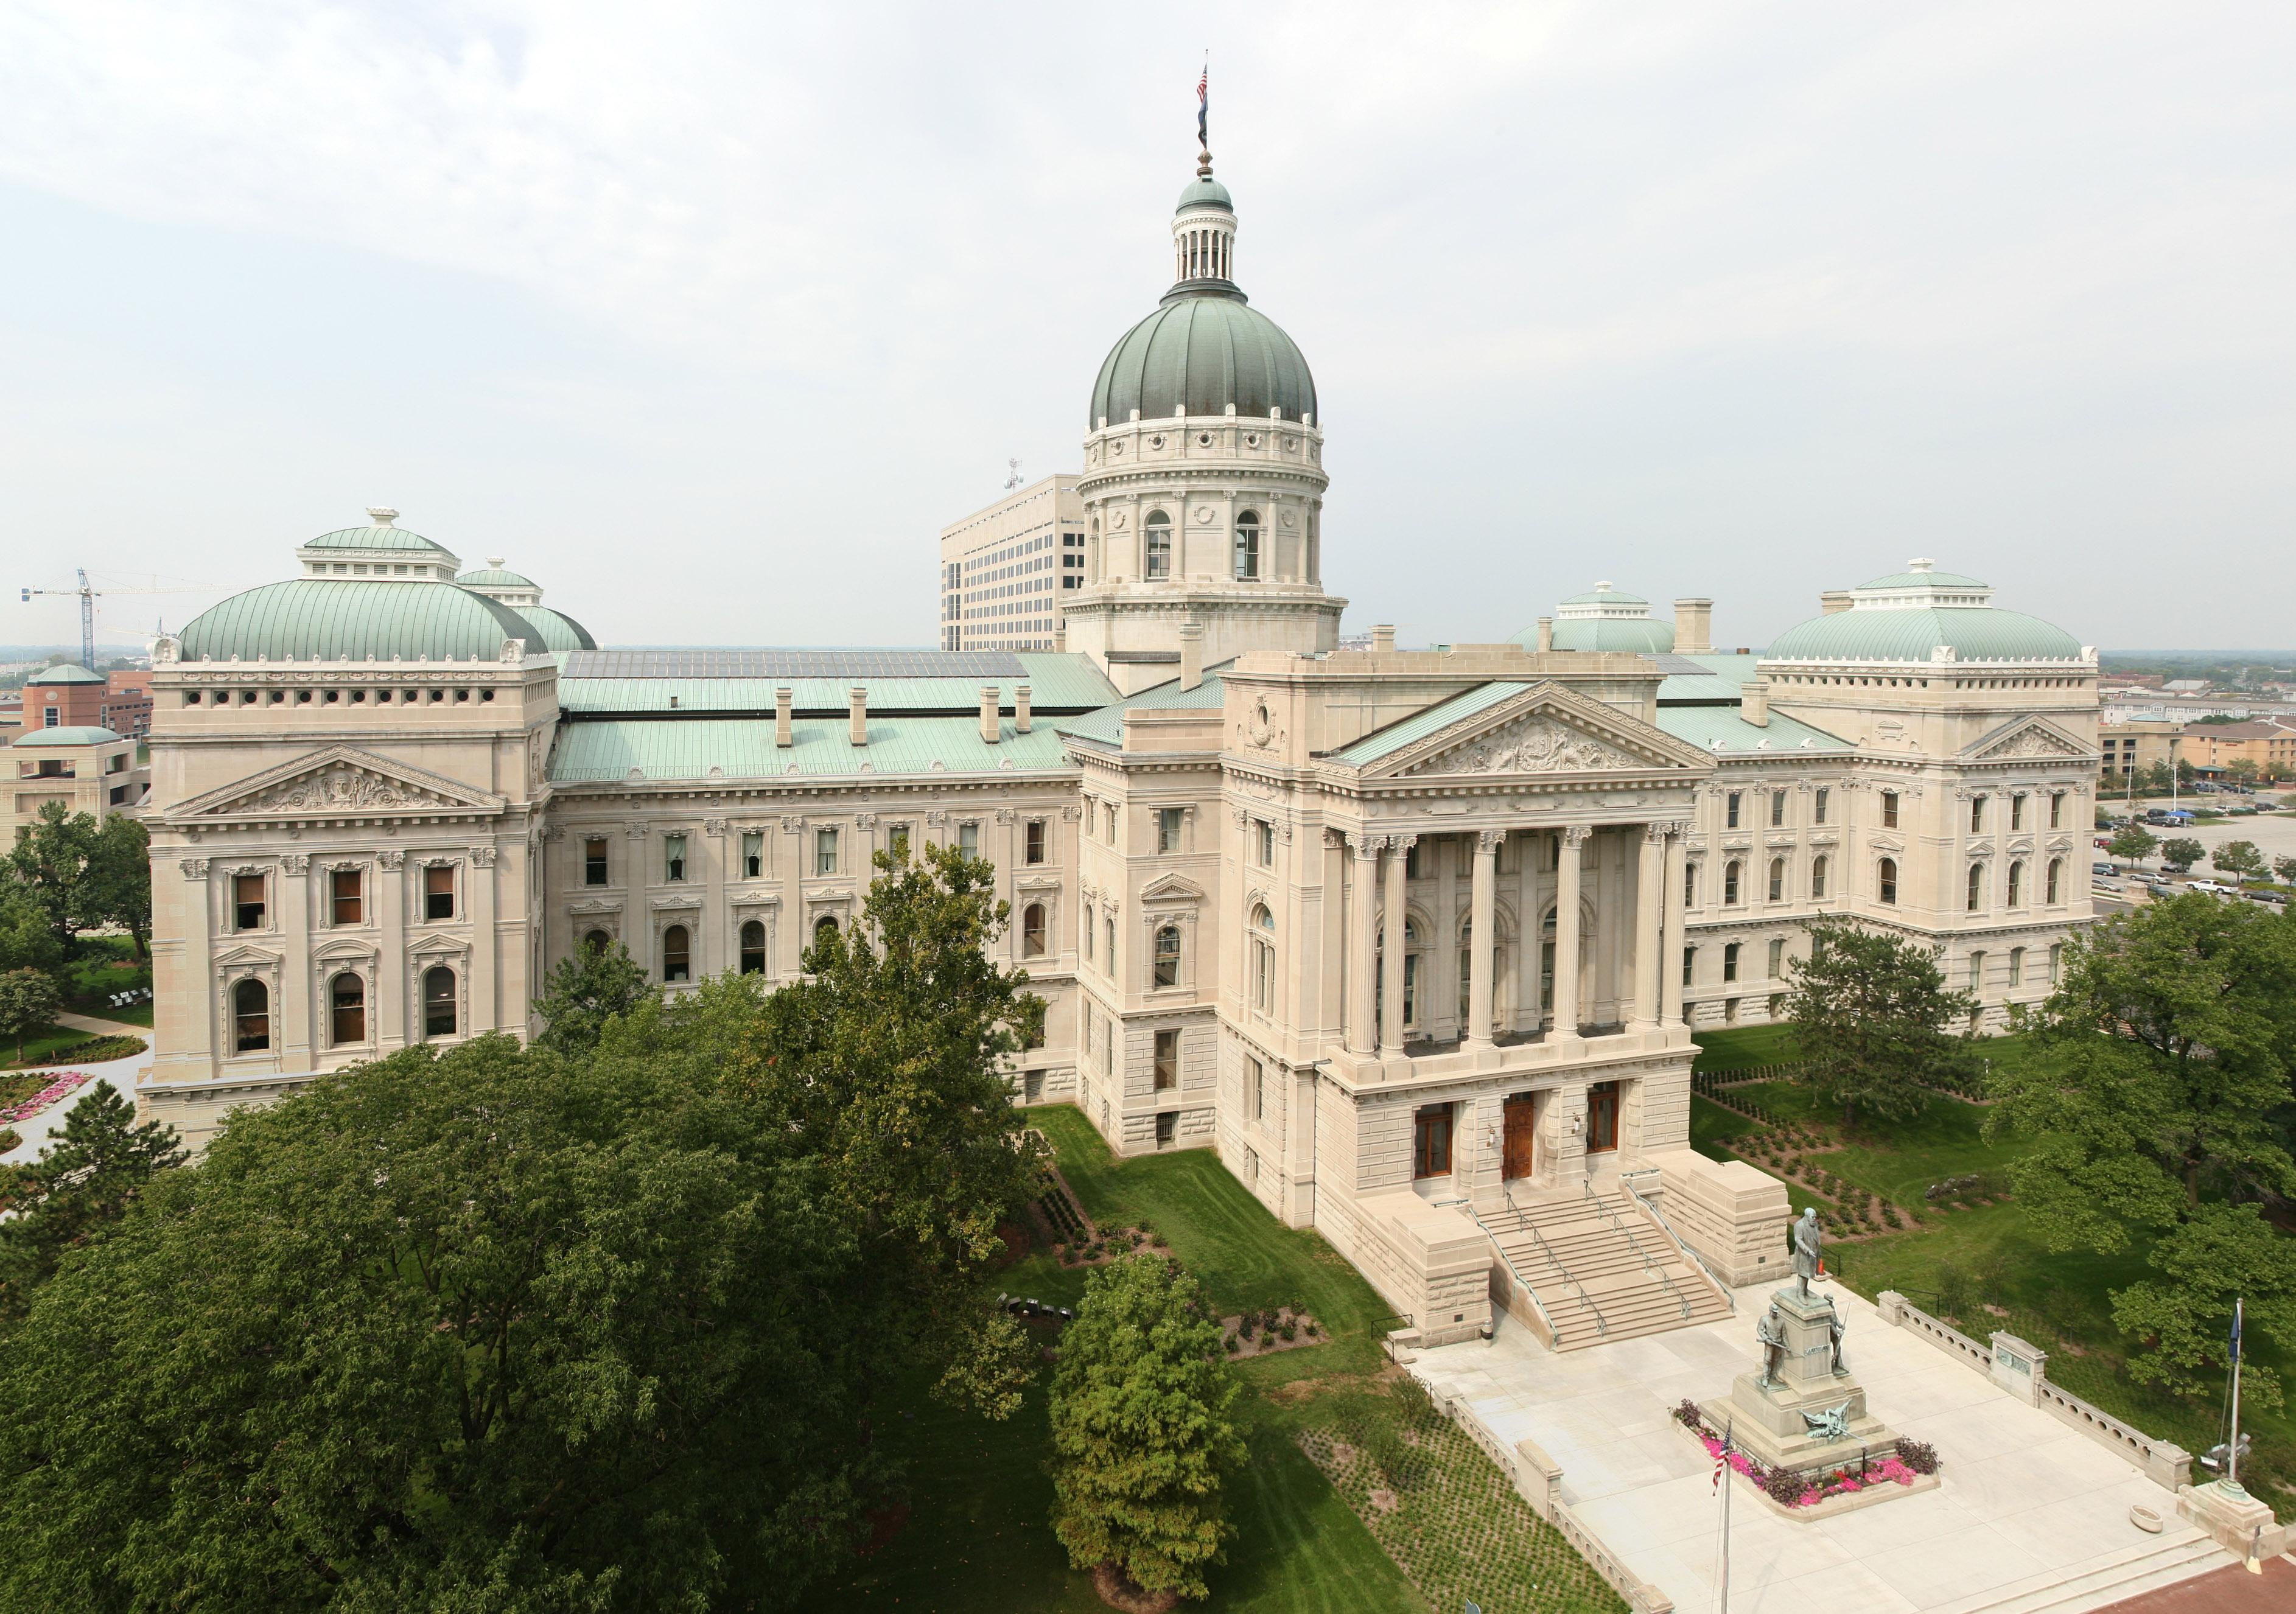 Indiana Capitol